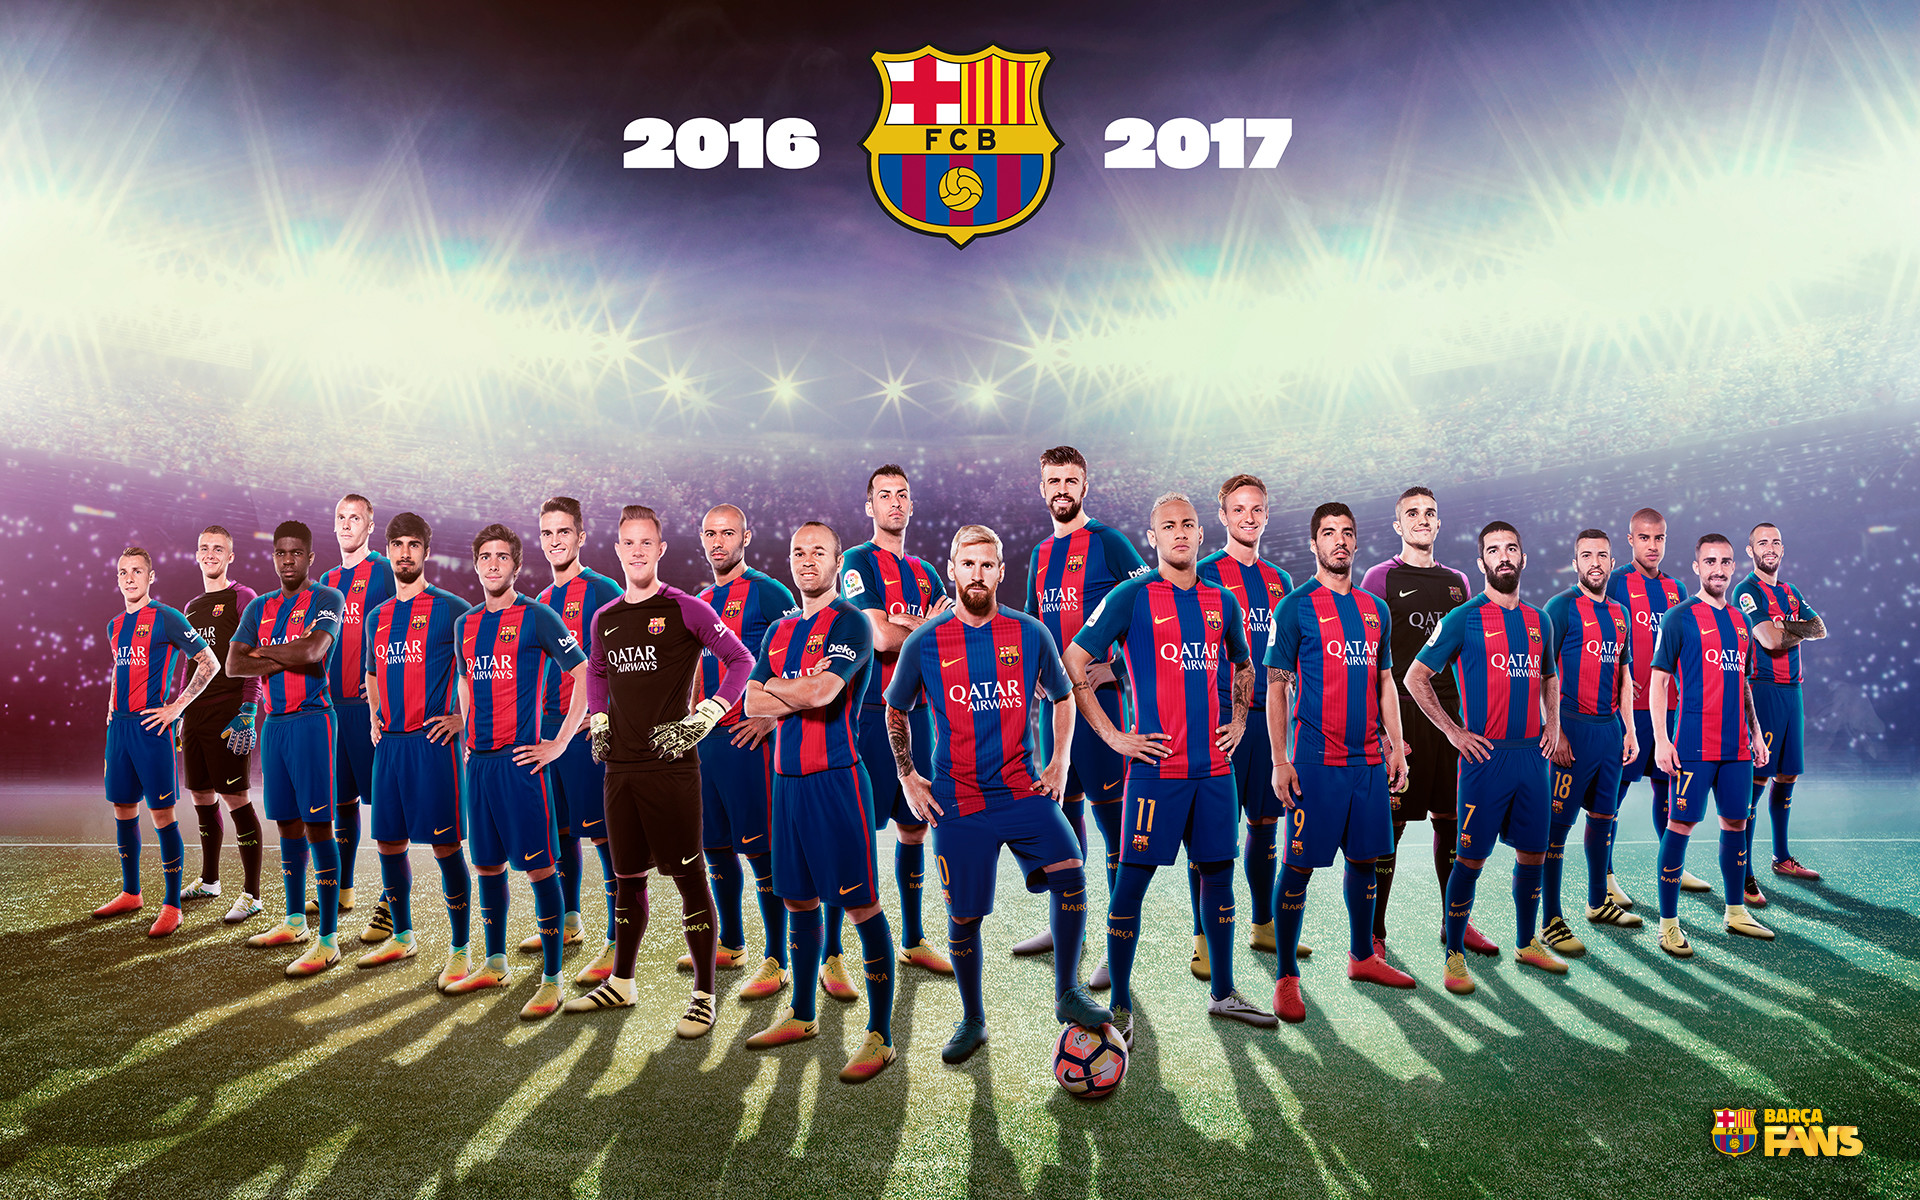 Fc Barcelona 2018 Wallpaper 70 Pictures